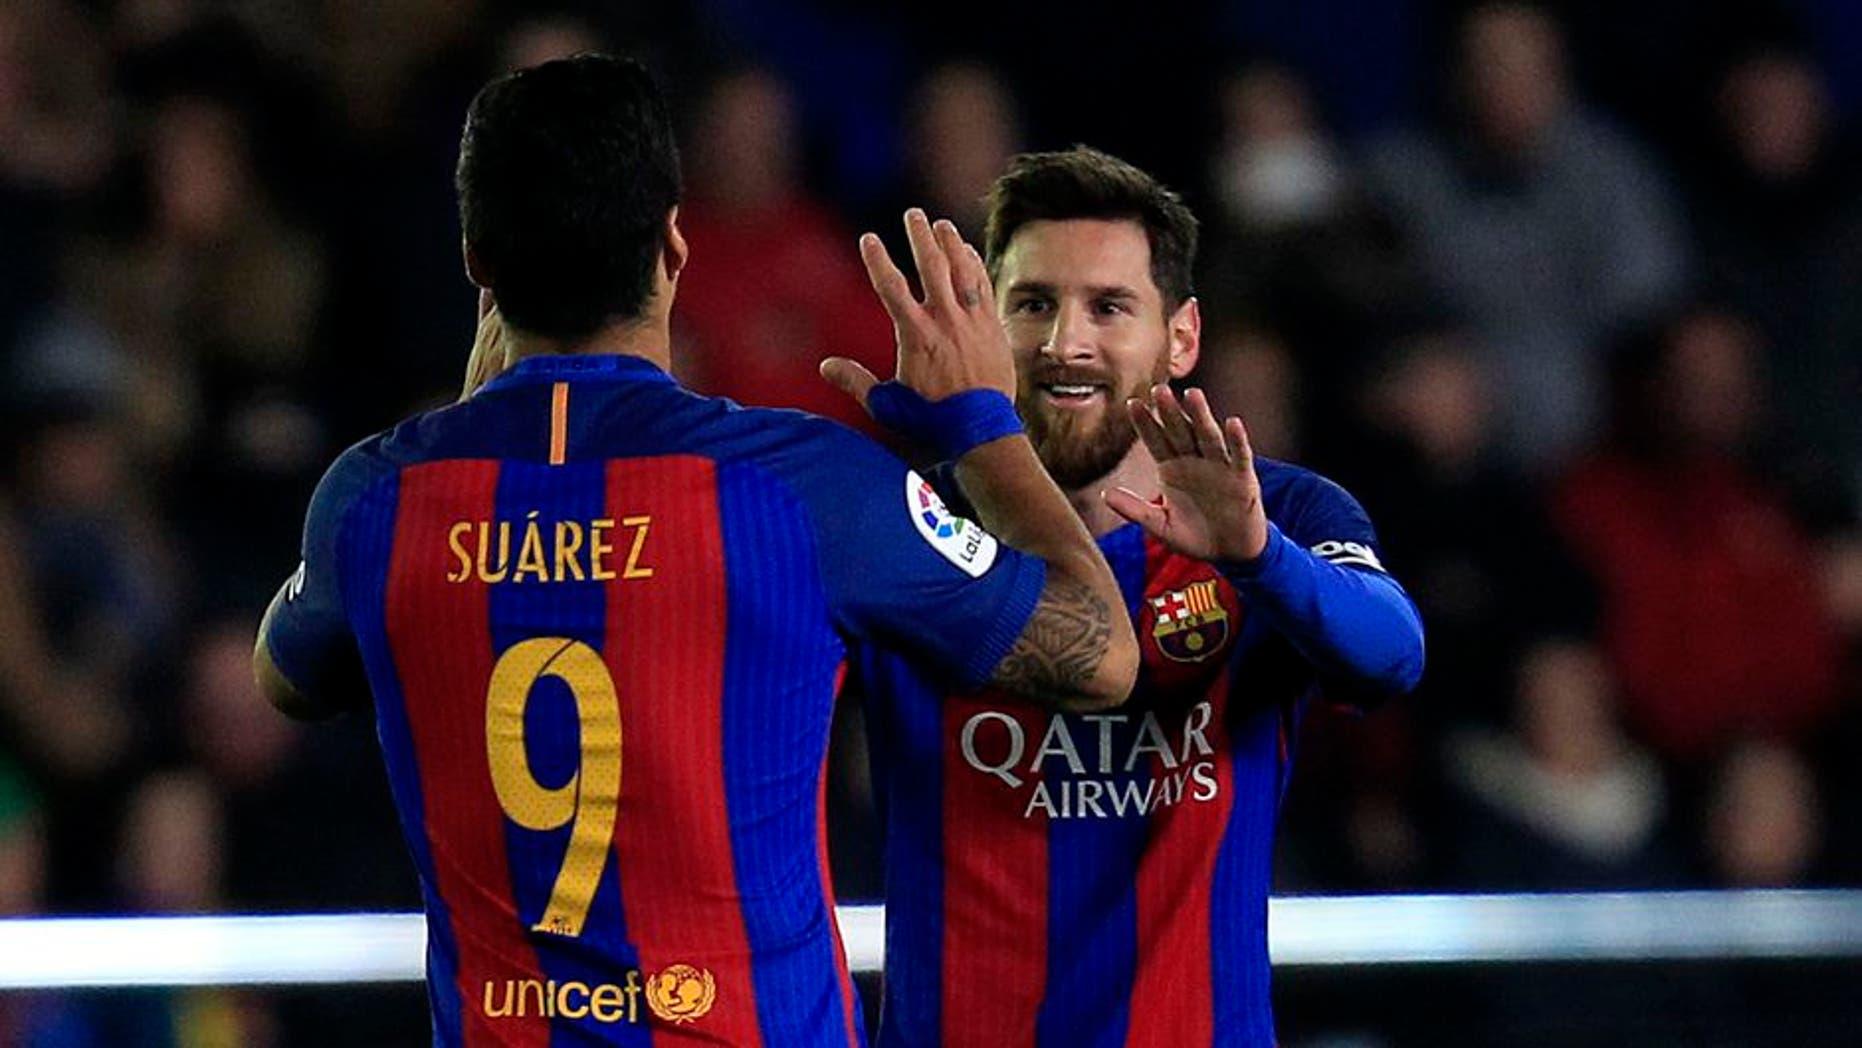 FC Barcelona's Lionel Messi, right, celebrates after scoring with his teammate Luis Suarez during the Spanish La Liga soccer match between Villarreal and Barcelona at the Ceramica stadium in Villarreal, Spain, Sunday, Jan. 8, 2017. (AP Photo/Alberto Saiz)